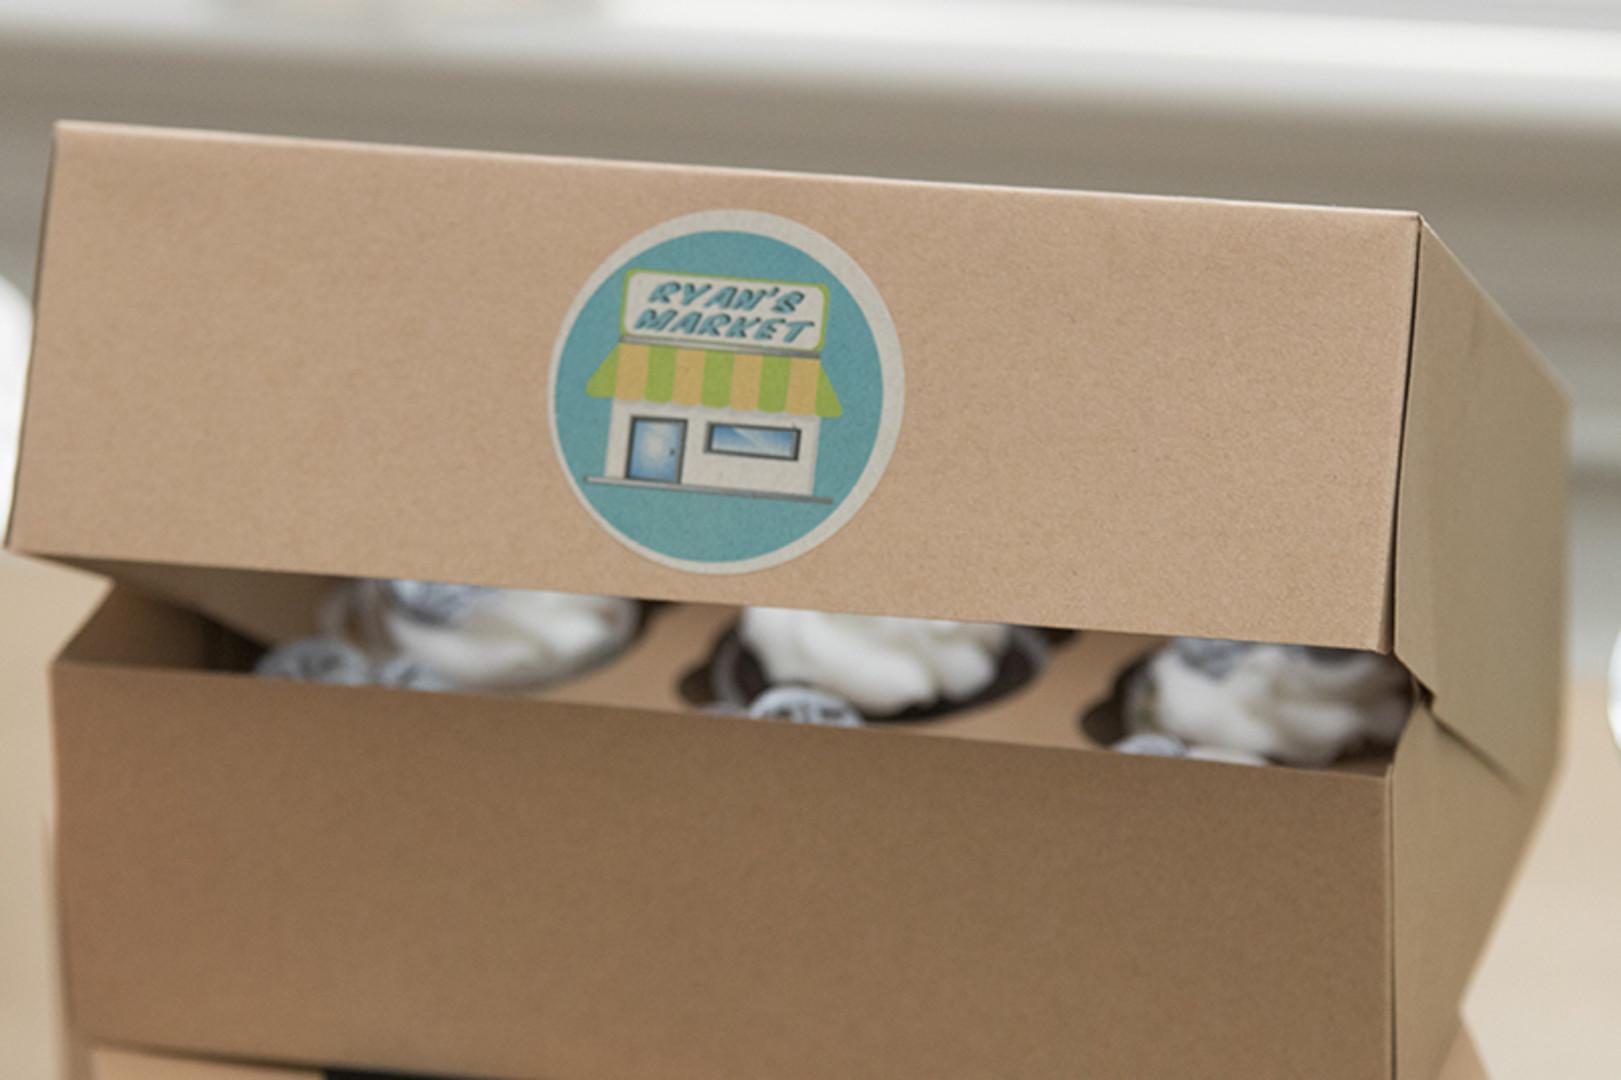 cardboard cupcake box with custom sticker